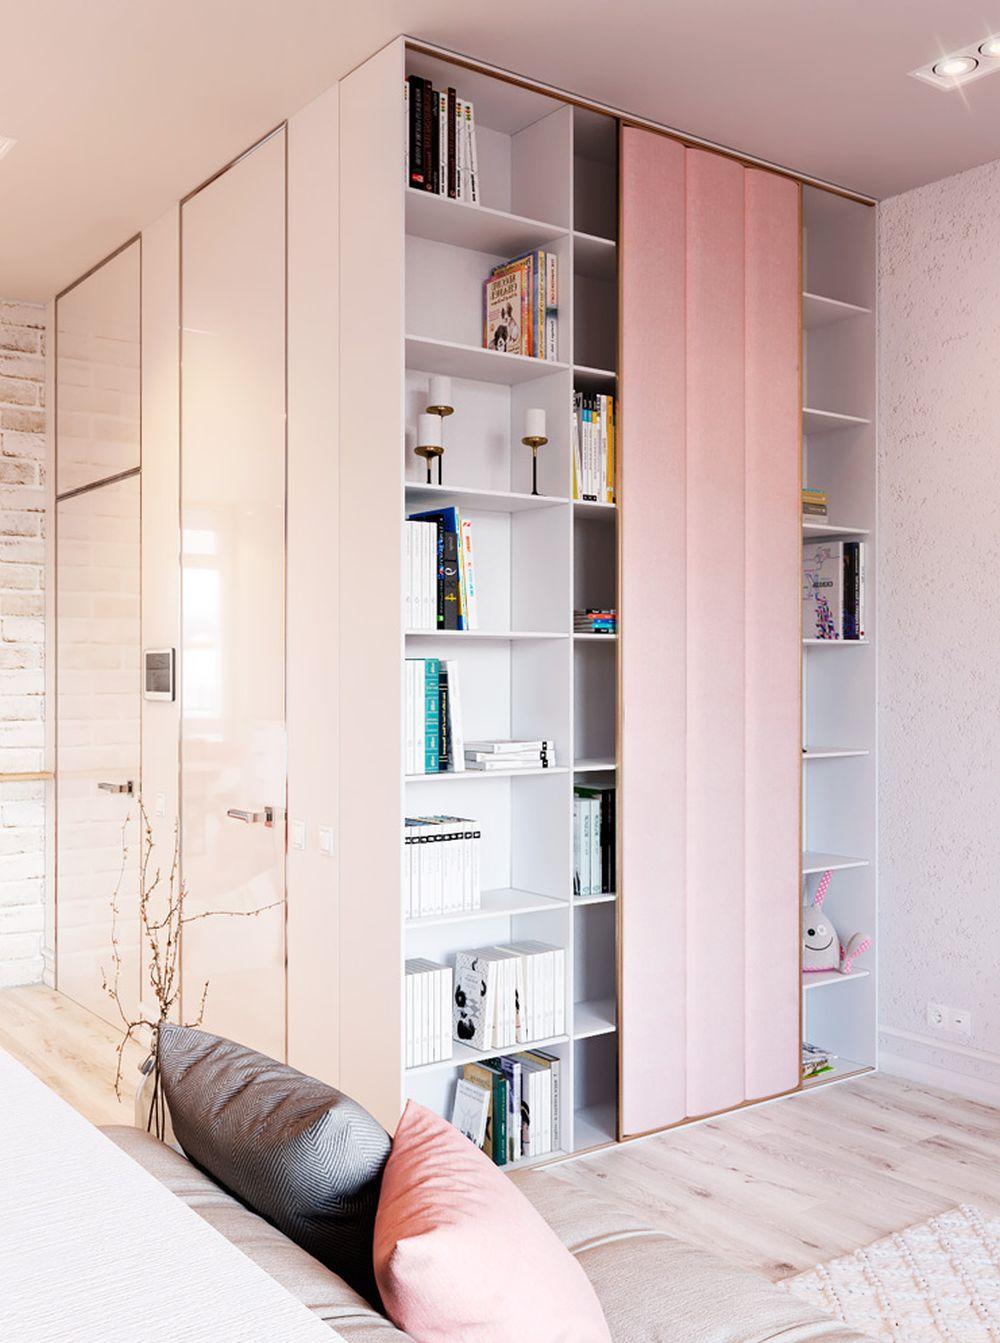 adelaparvu.com despre apartament in nuante delicate, designer Dima Kravtsov (7)